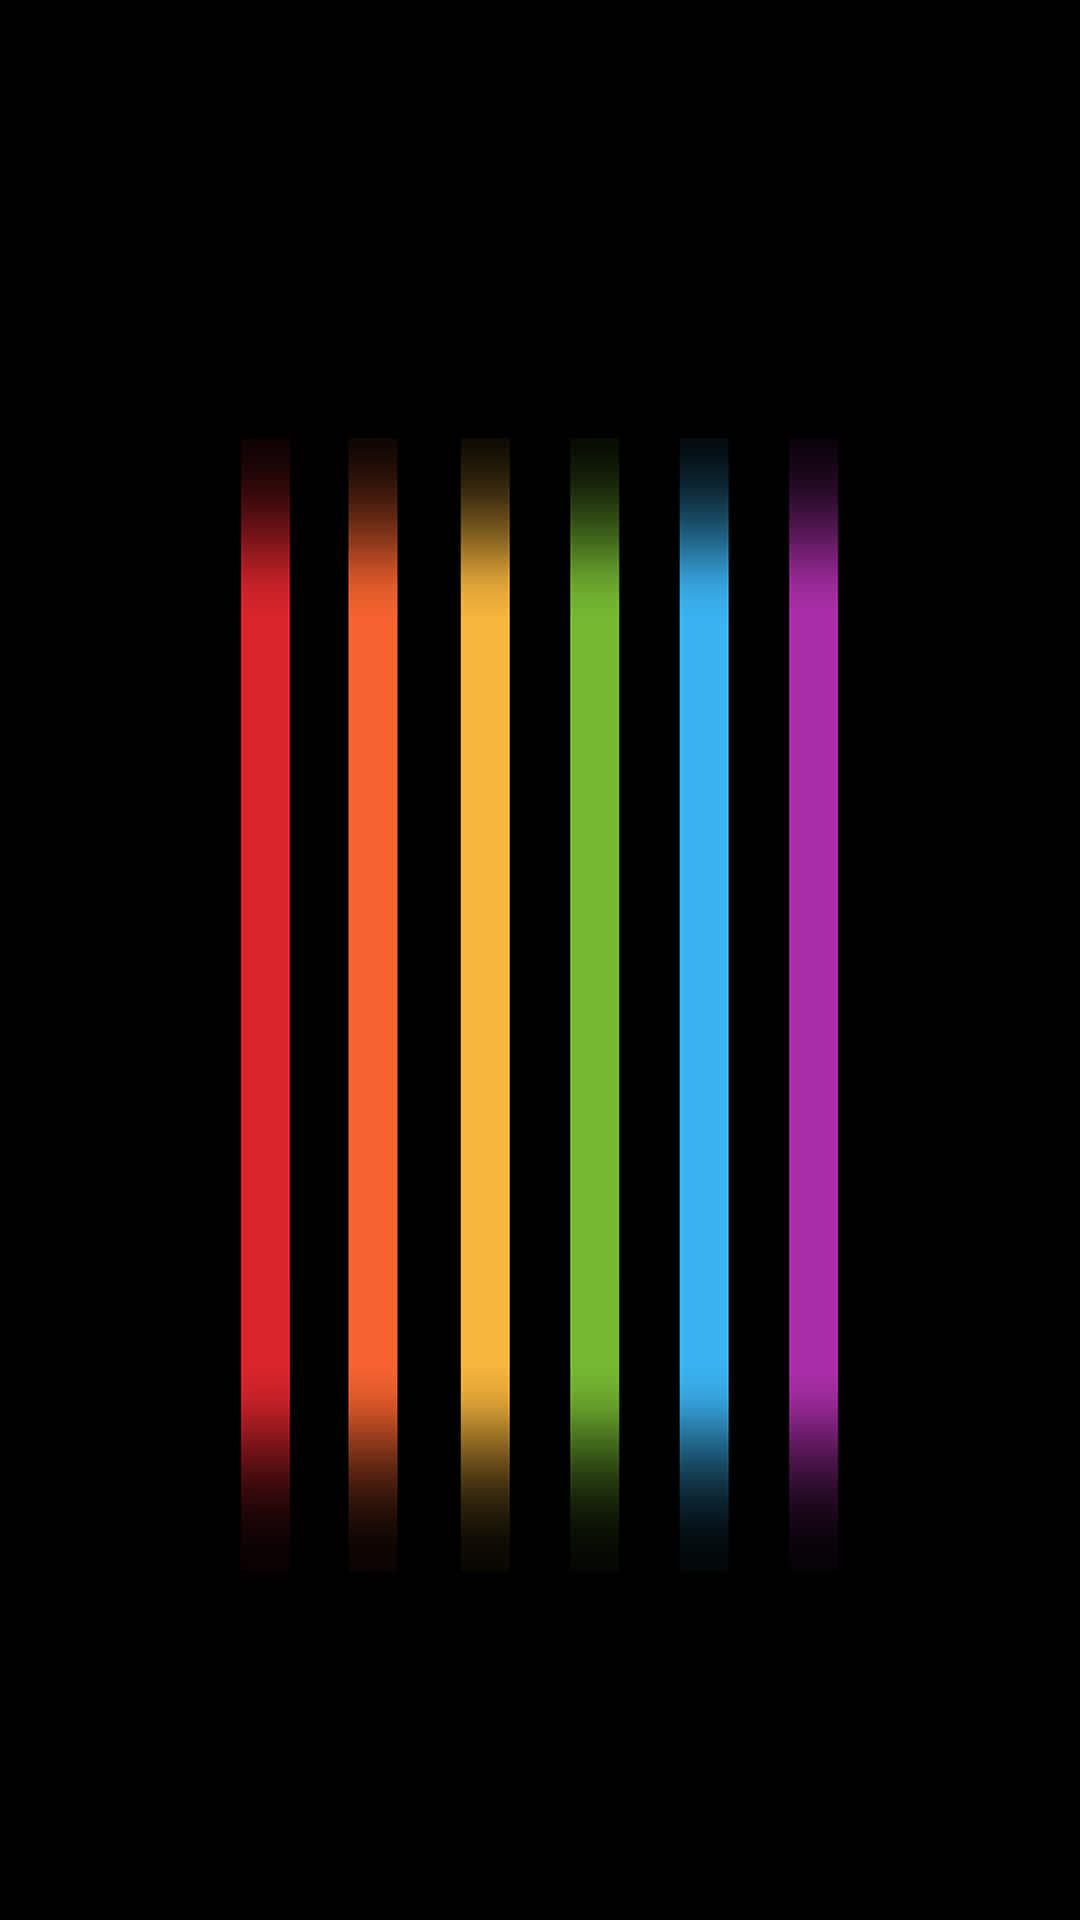 Apple Watch Face Pride Wallpaper By Ar07 - Darkness , HD Wallpaper & Backgrounds